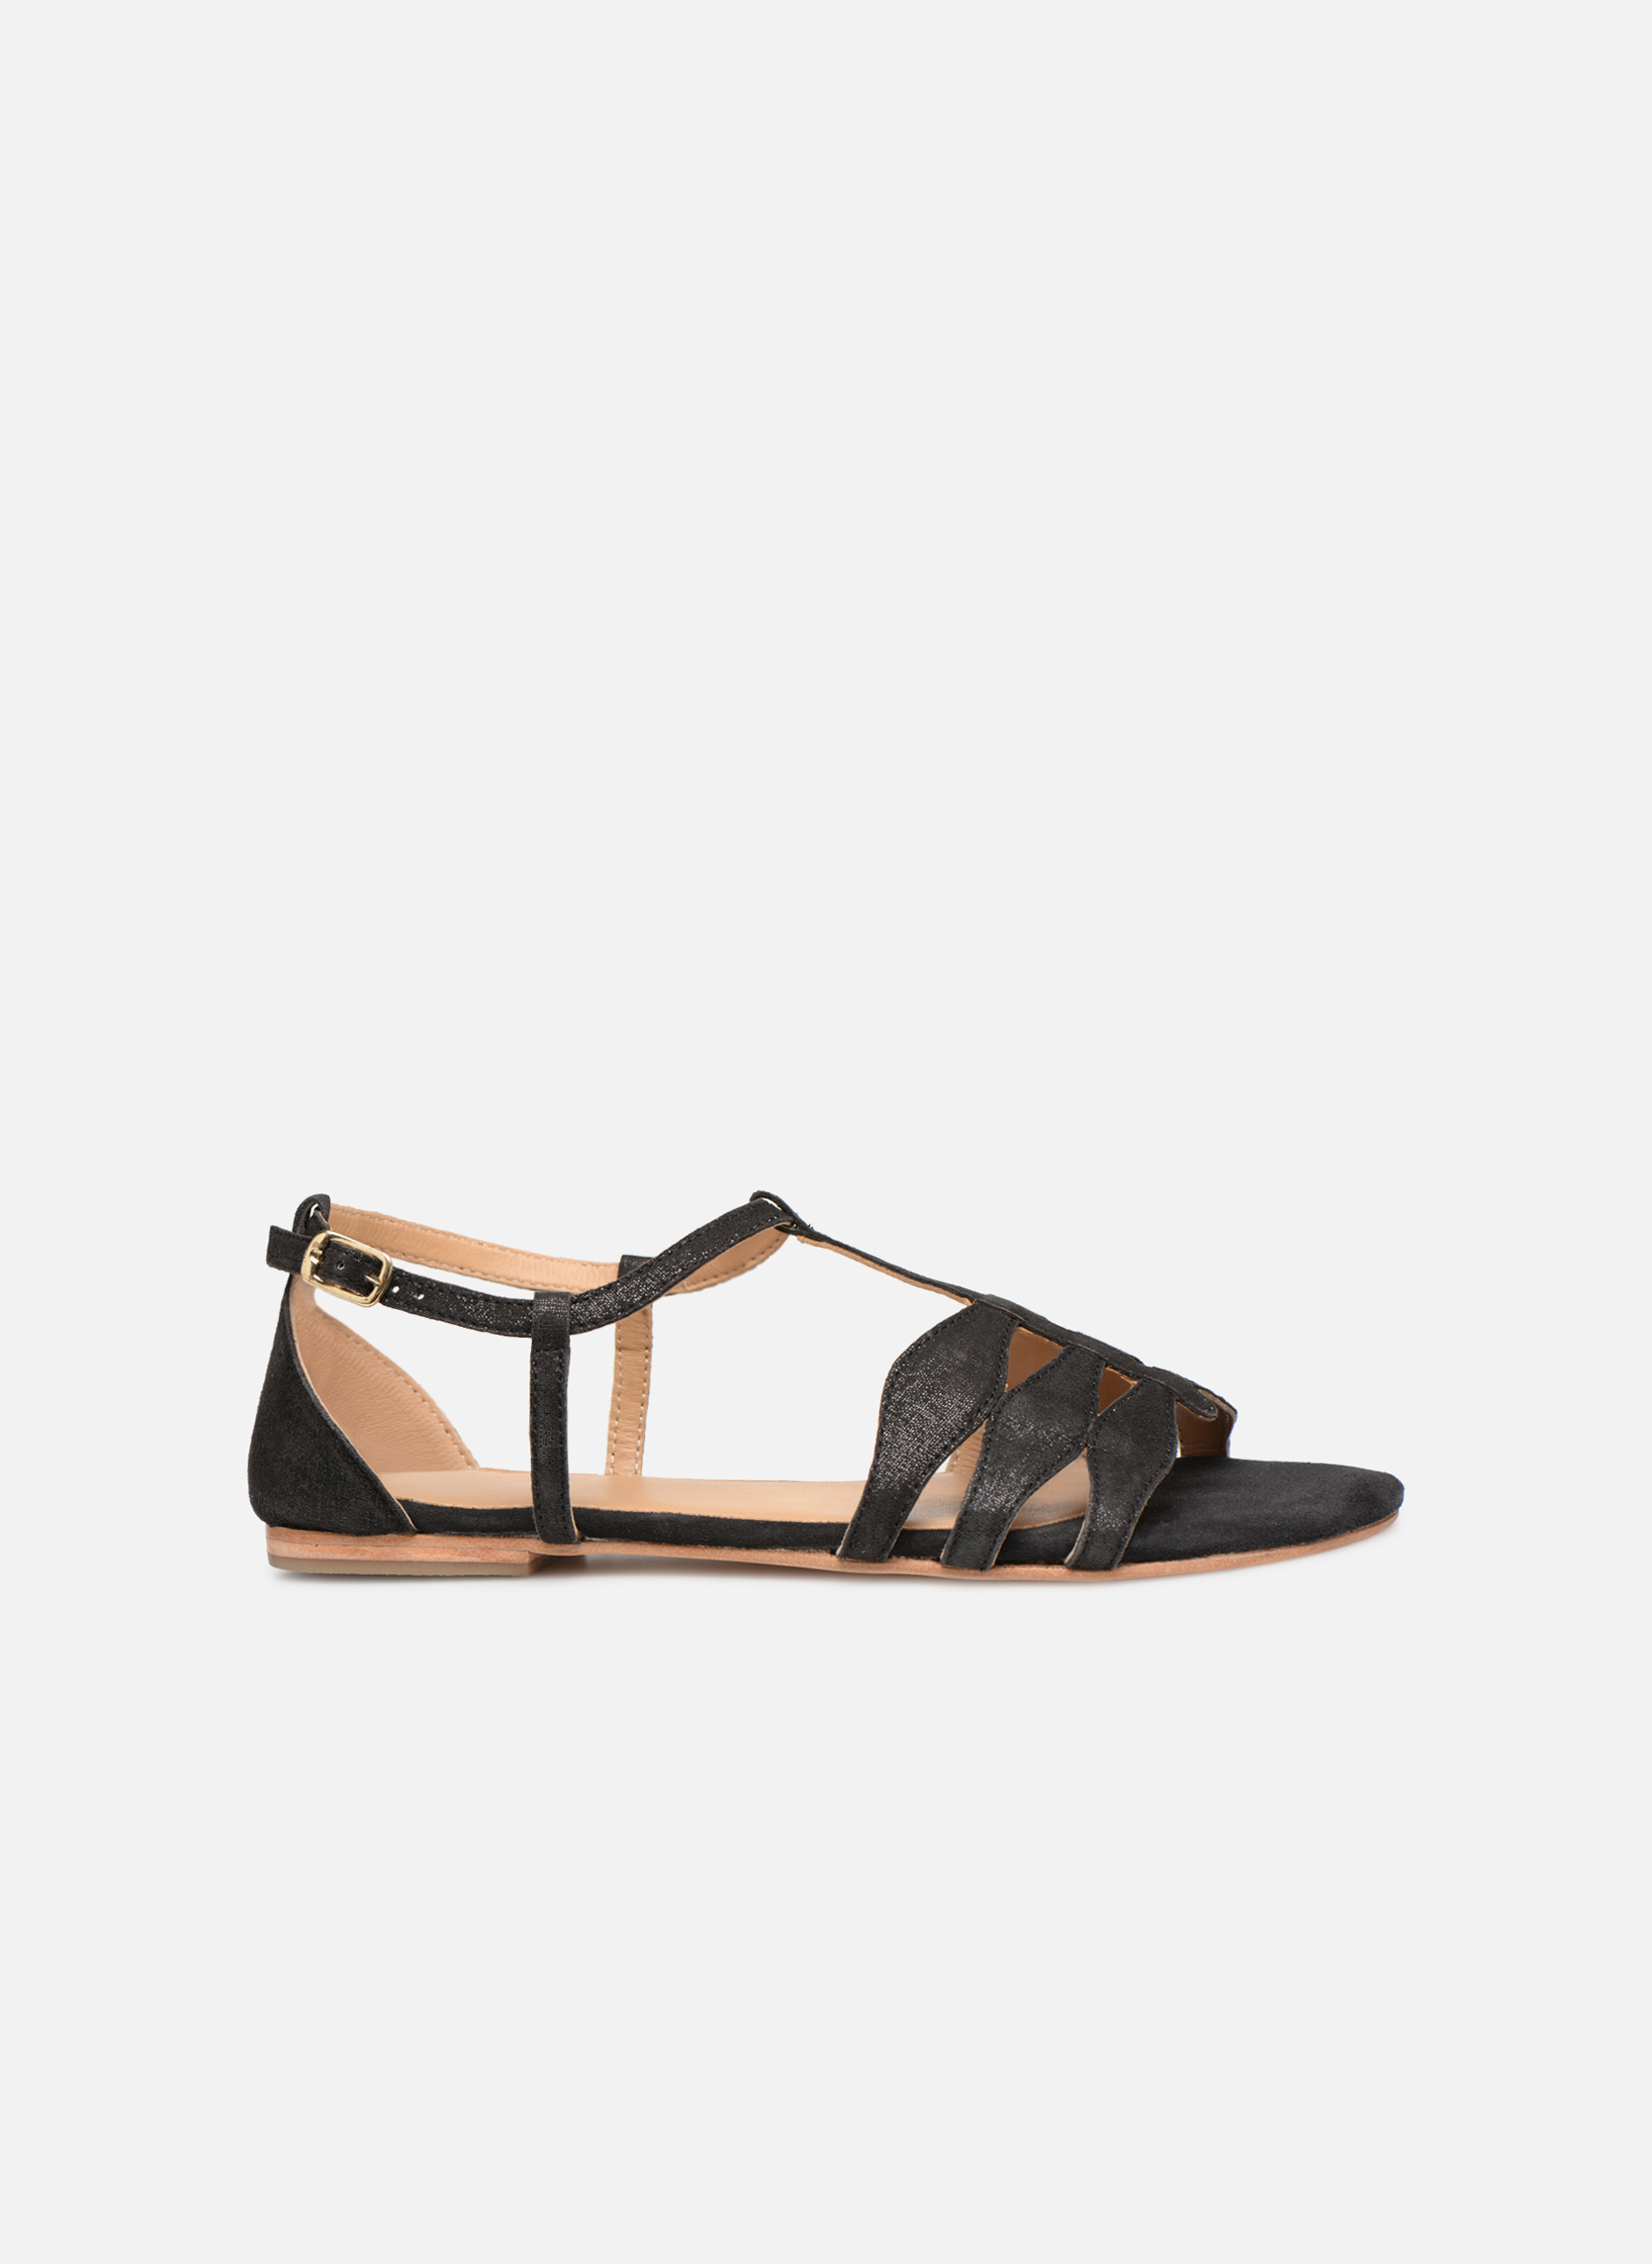 Sandals Women Bombay Babes Sandales Plates #4